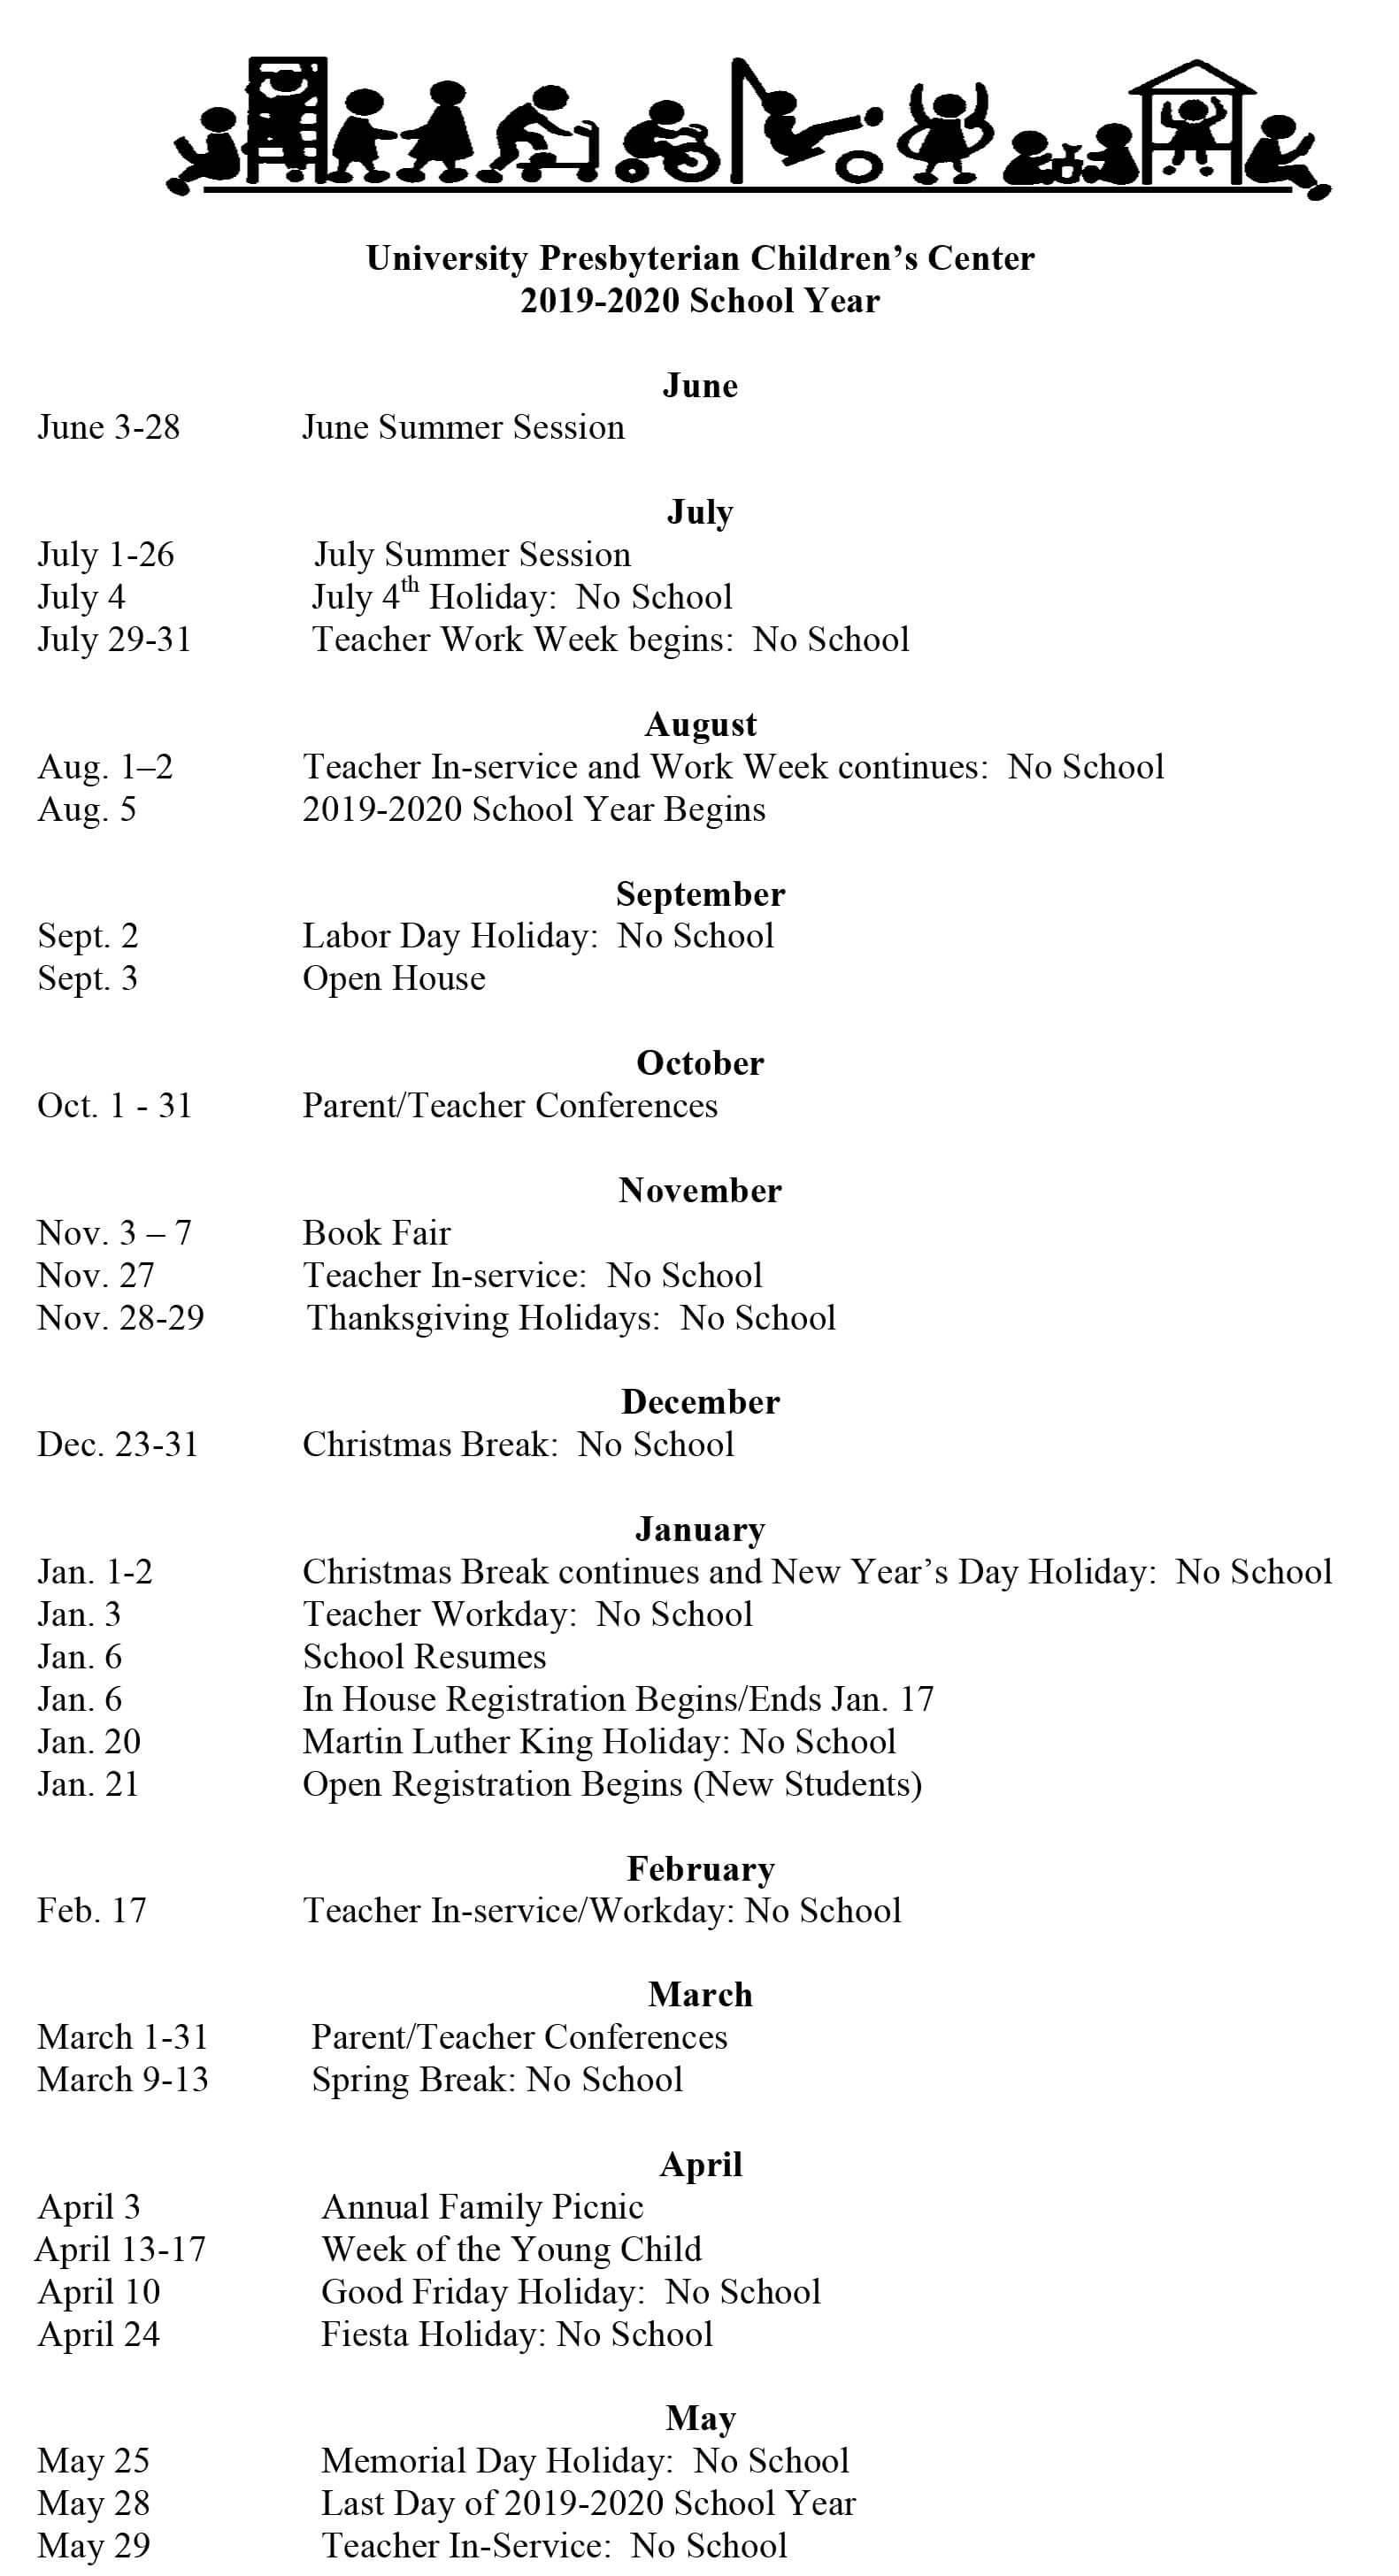 UPCC 2019-2020 calendar